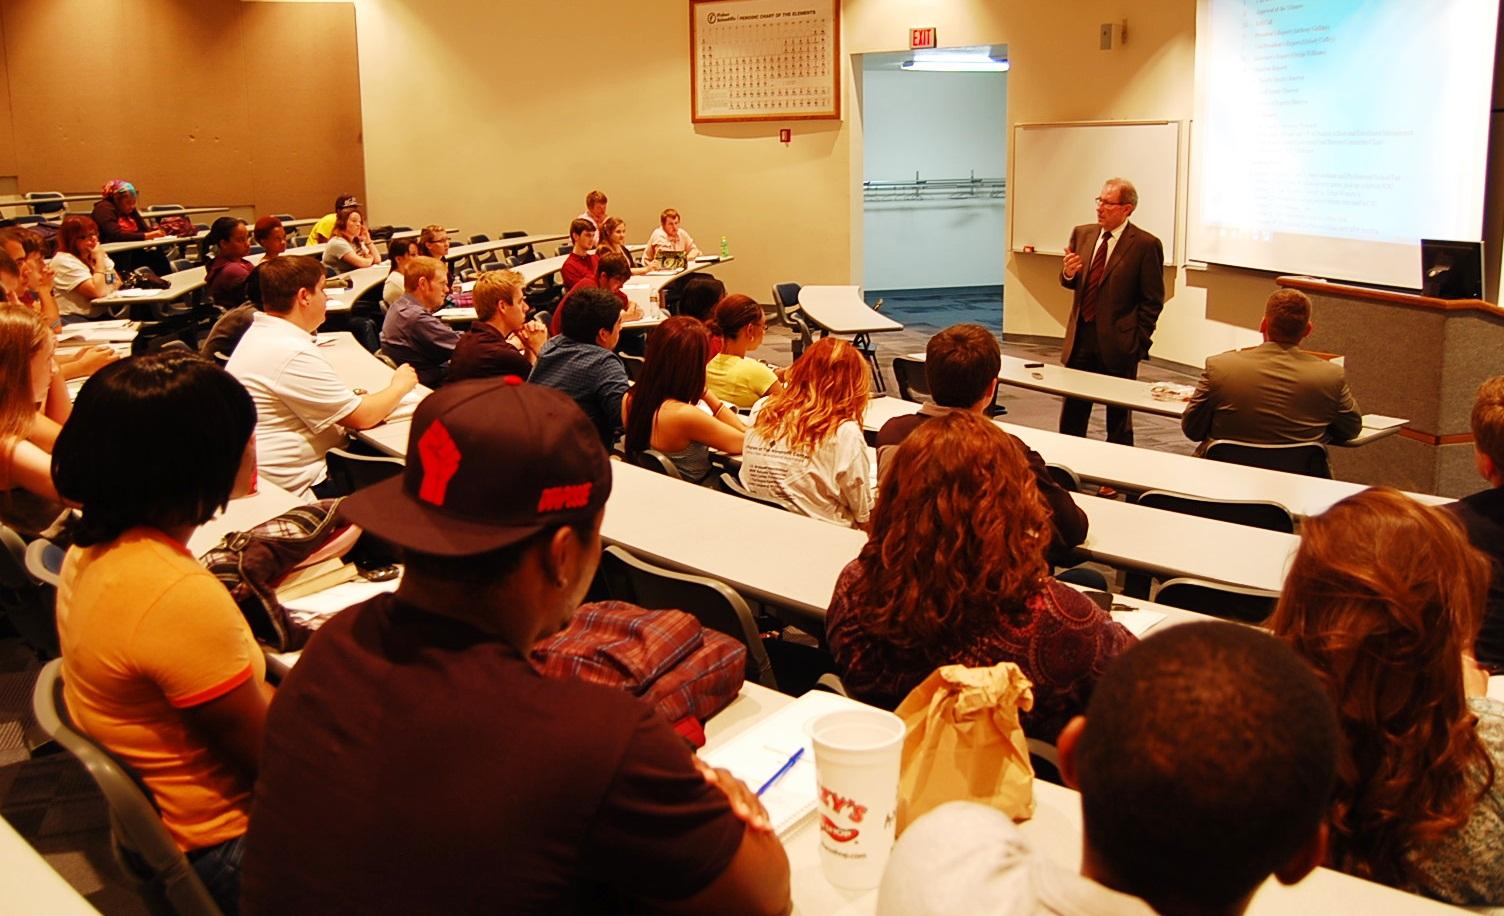 Higher standards cause lower enrollment